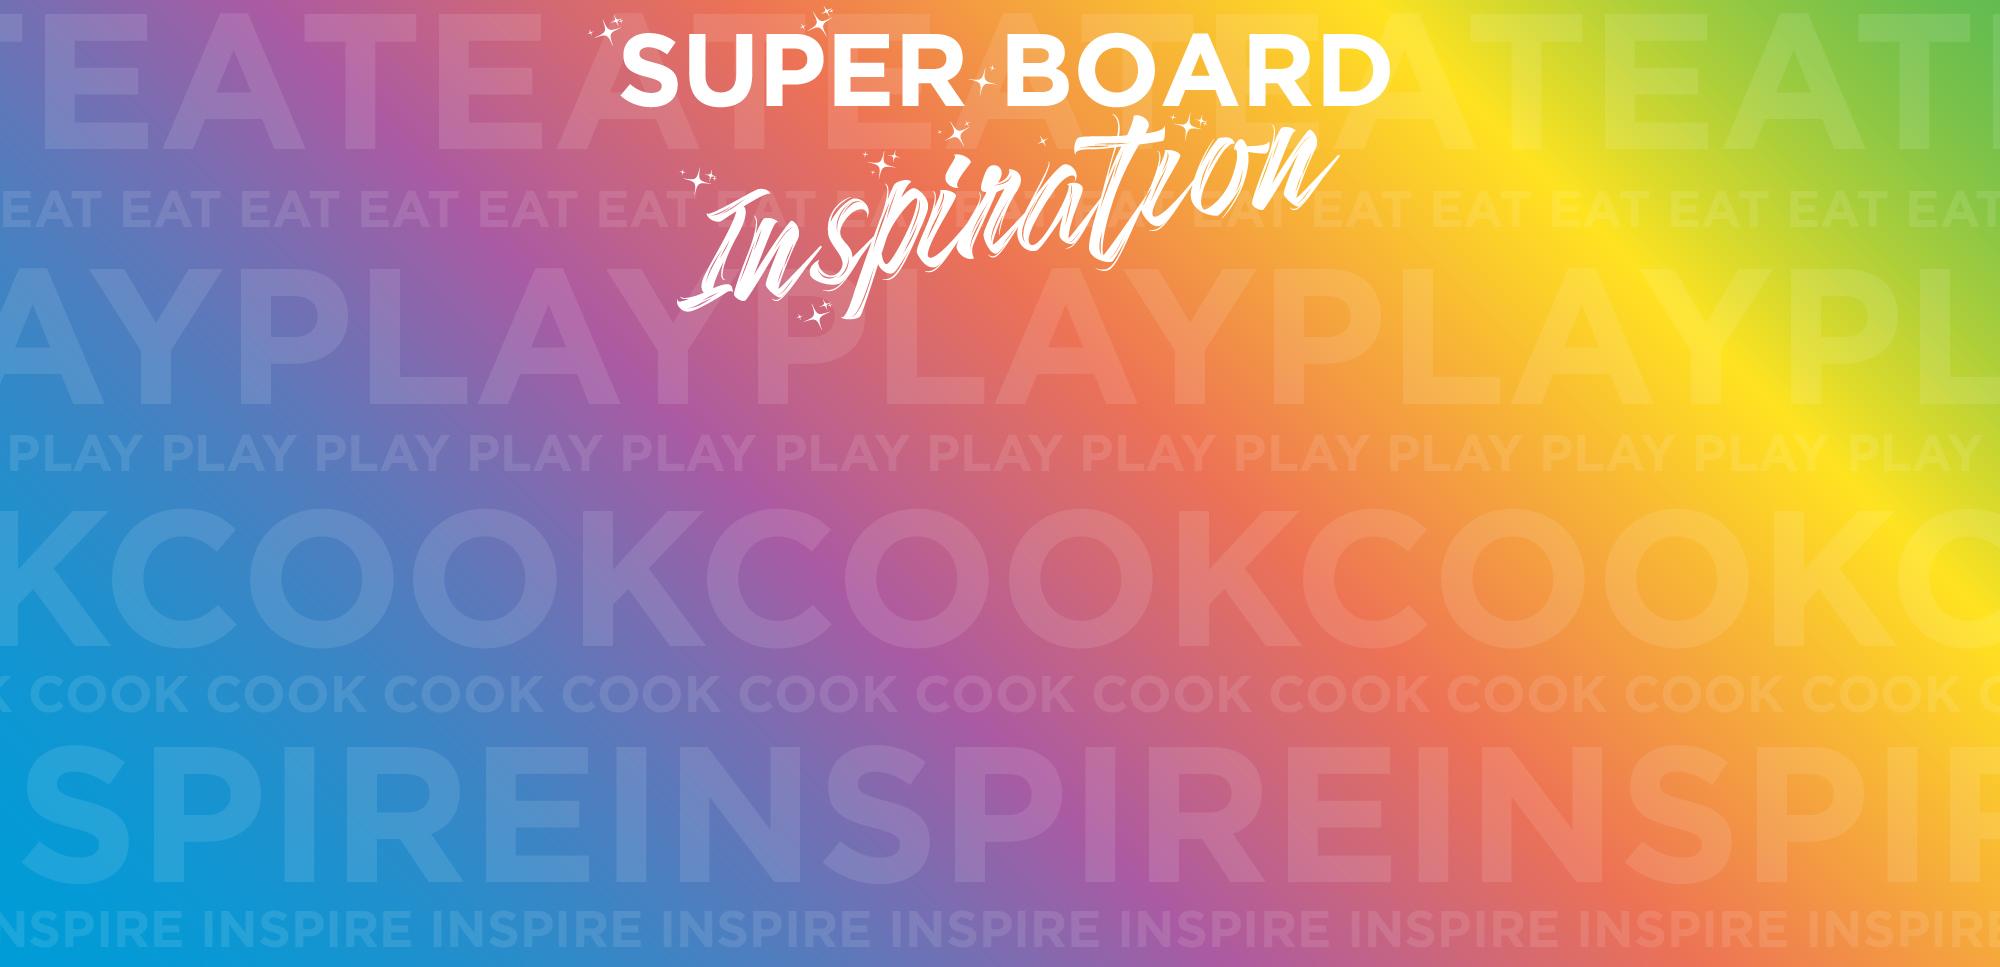 Eat-Play-Cook-Inspire with Cosmic Crisp®